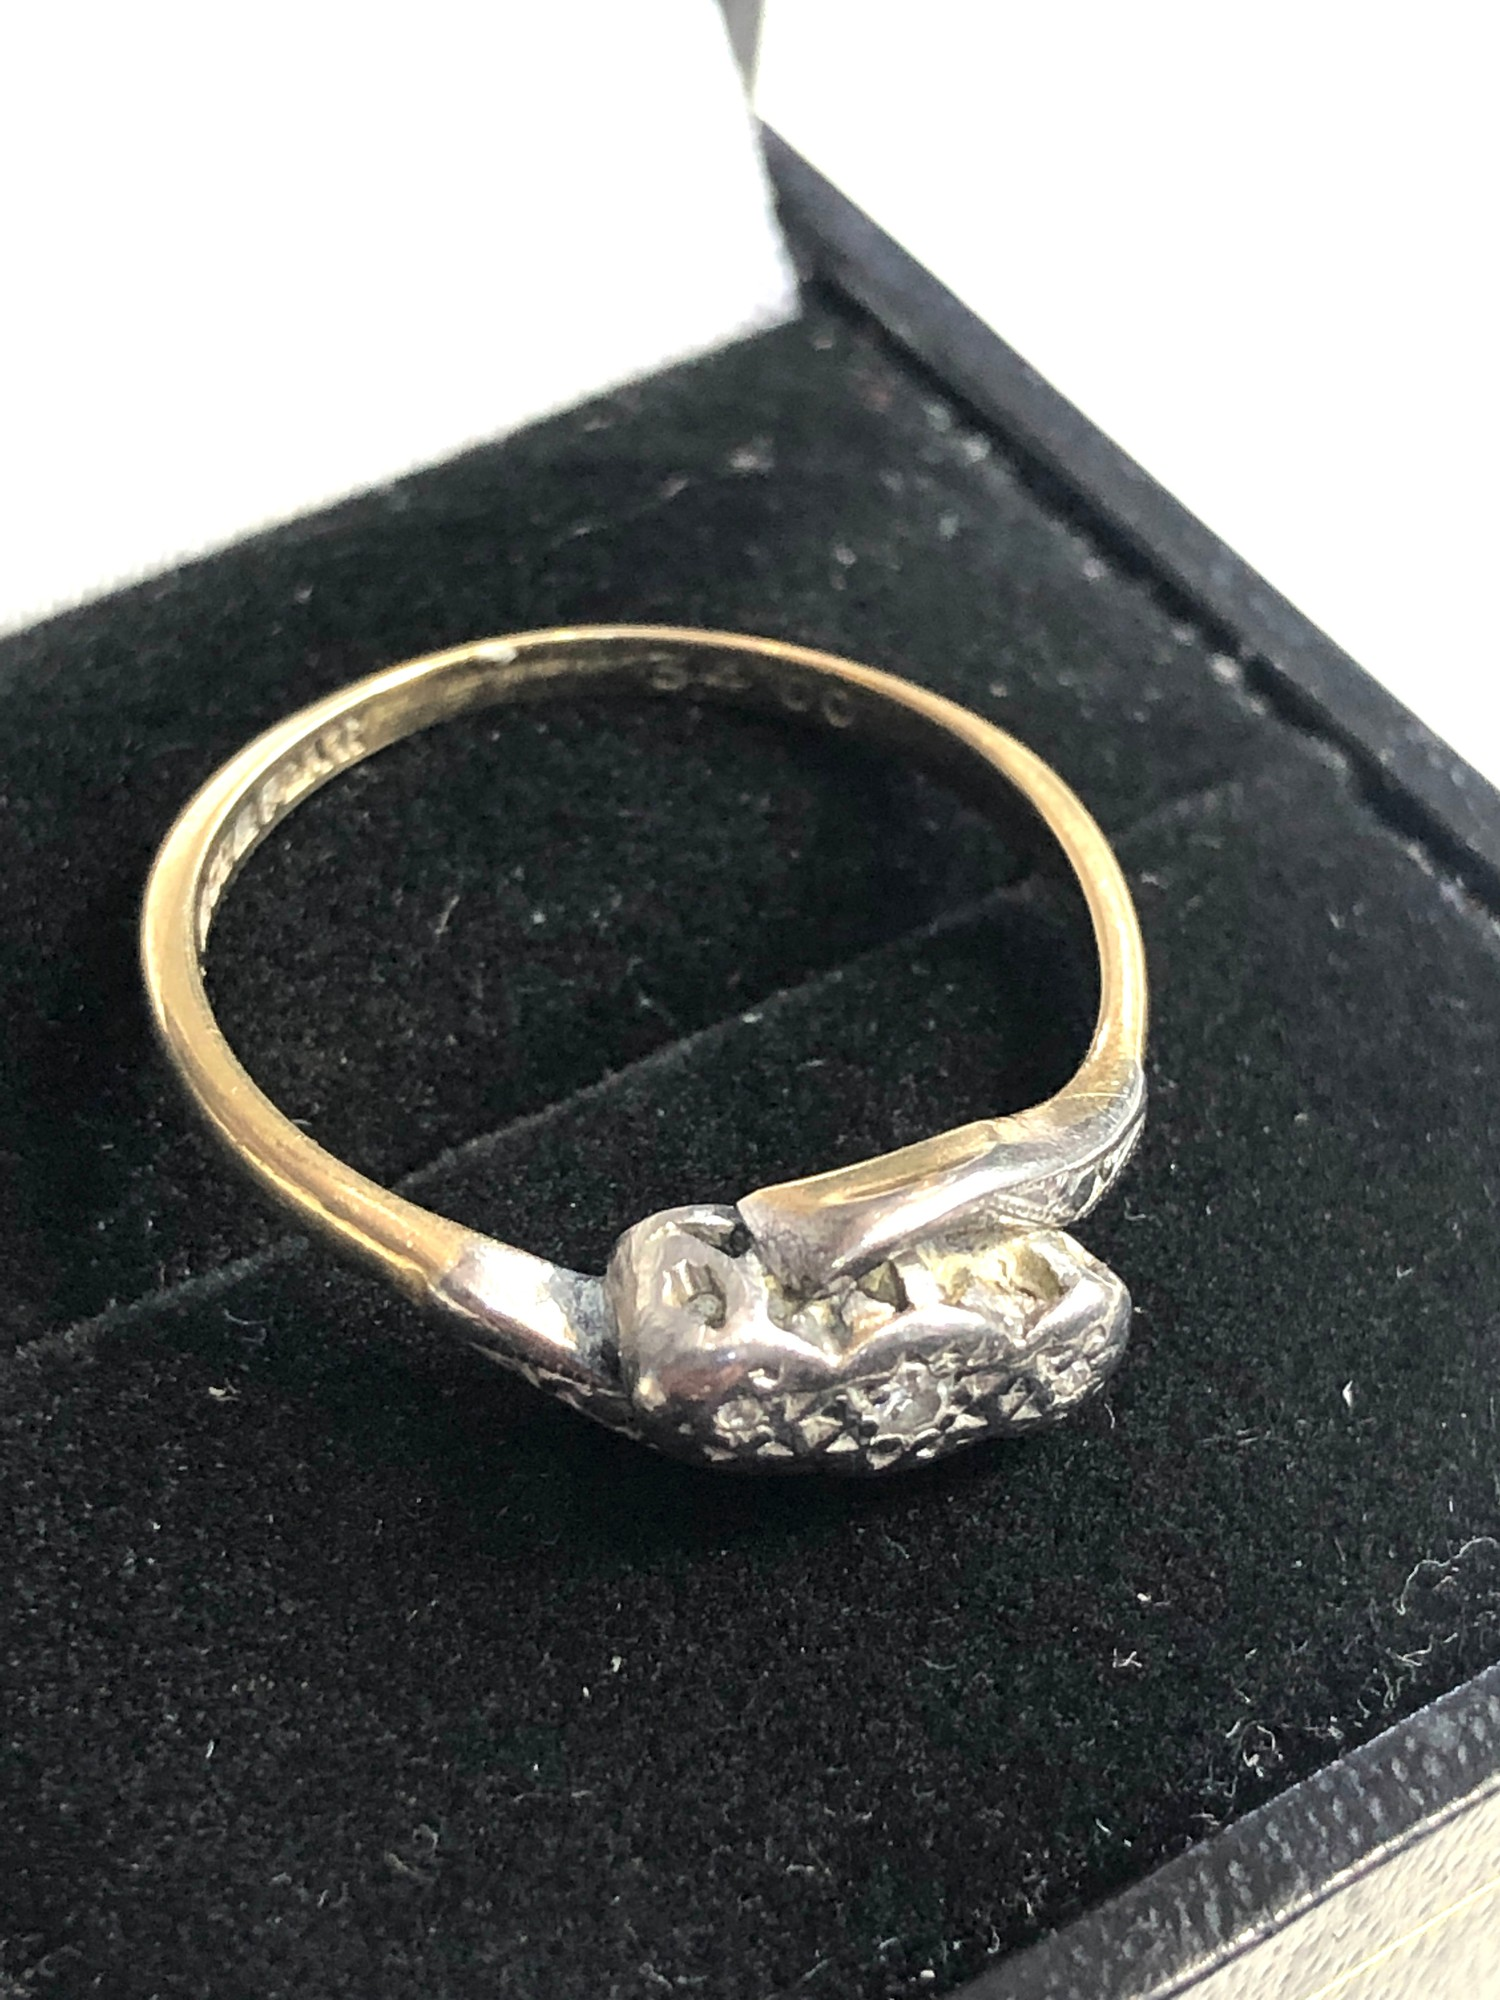 Antique 18ct & platinum diamond trilogy ring weight 2.8g - Image 3 of 4